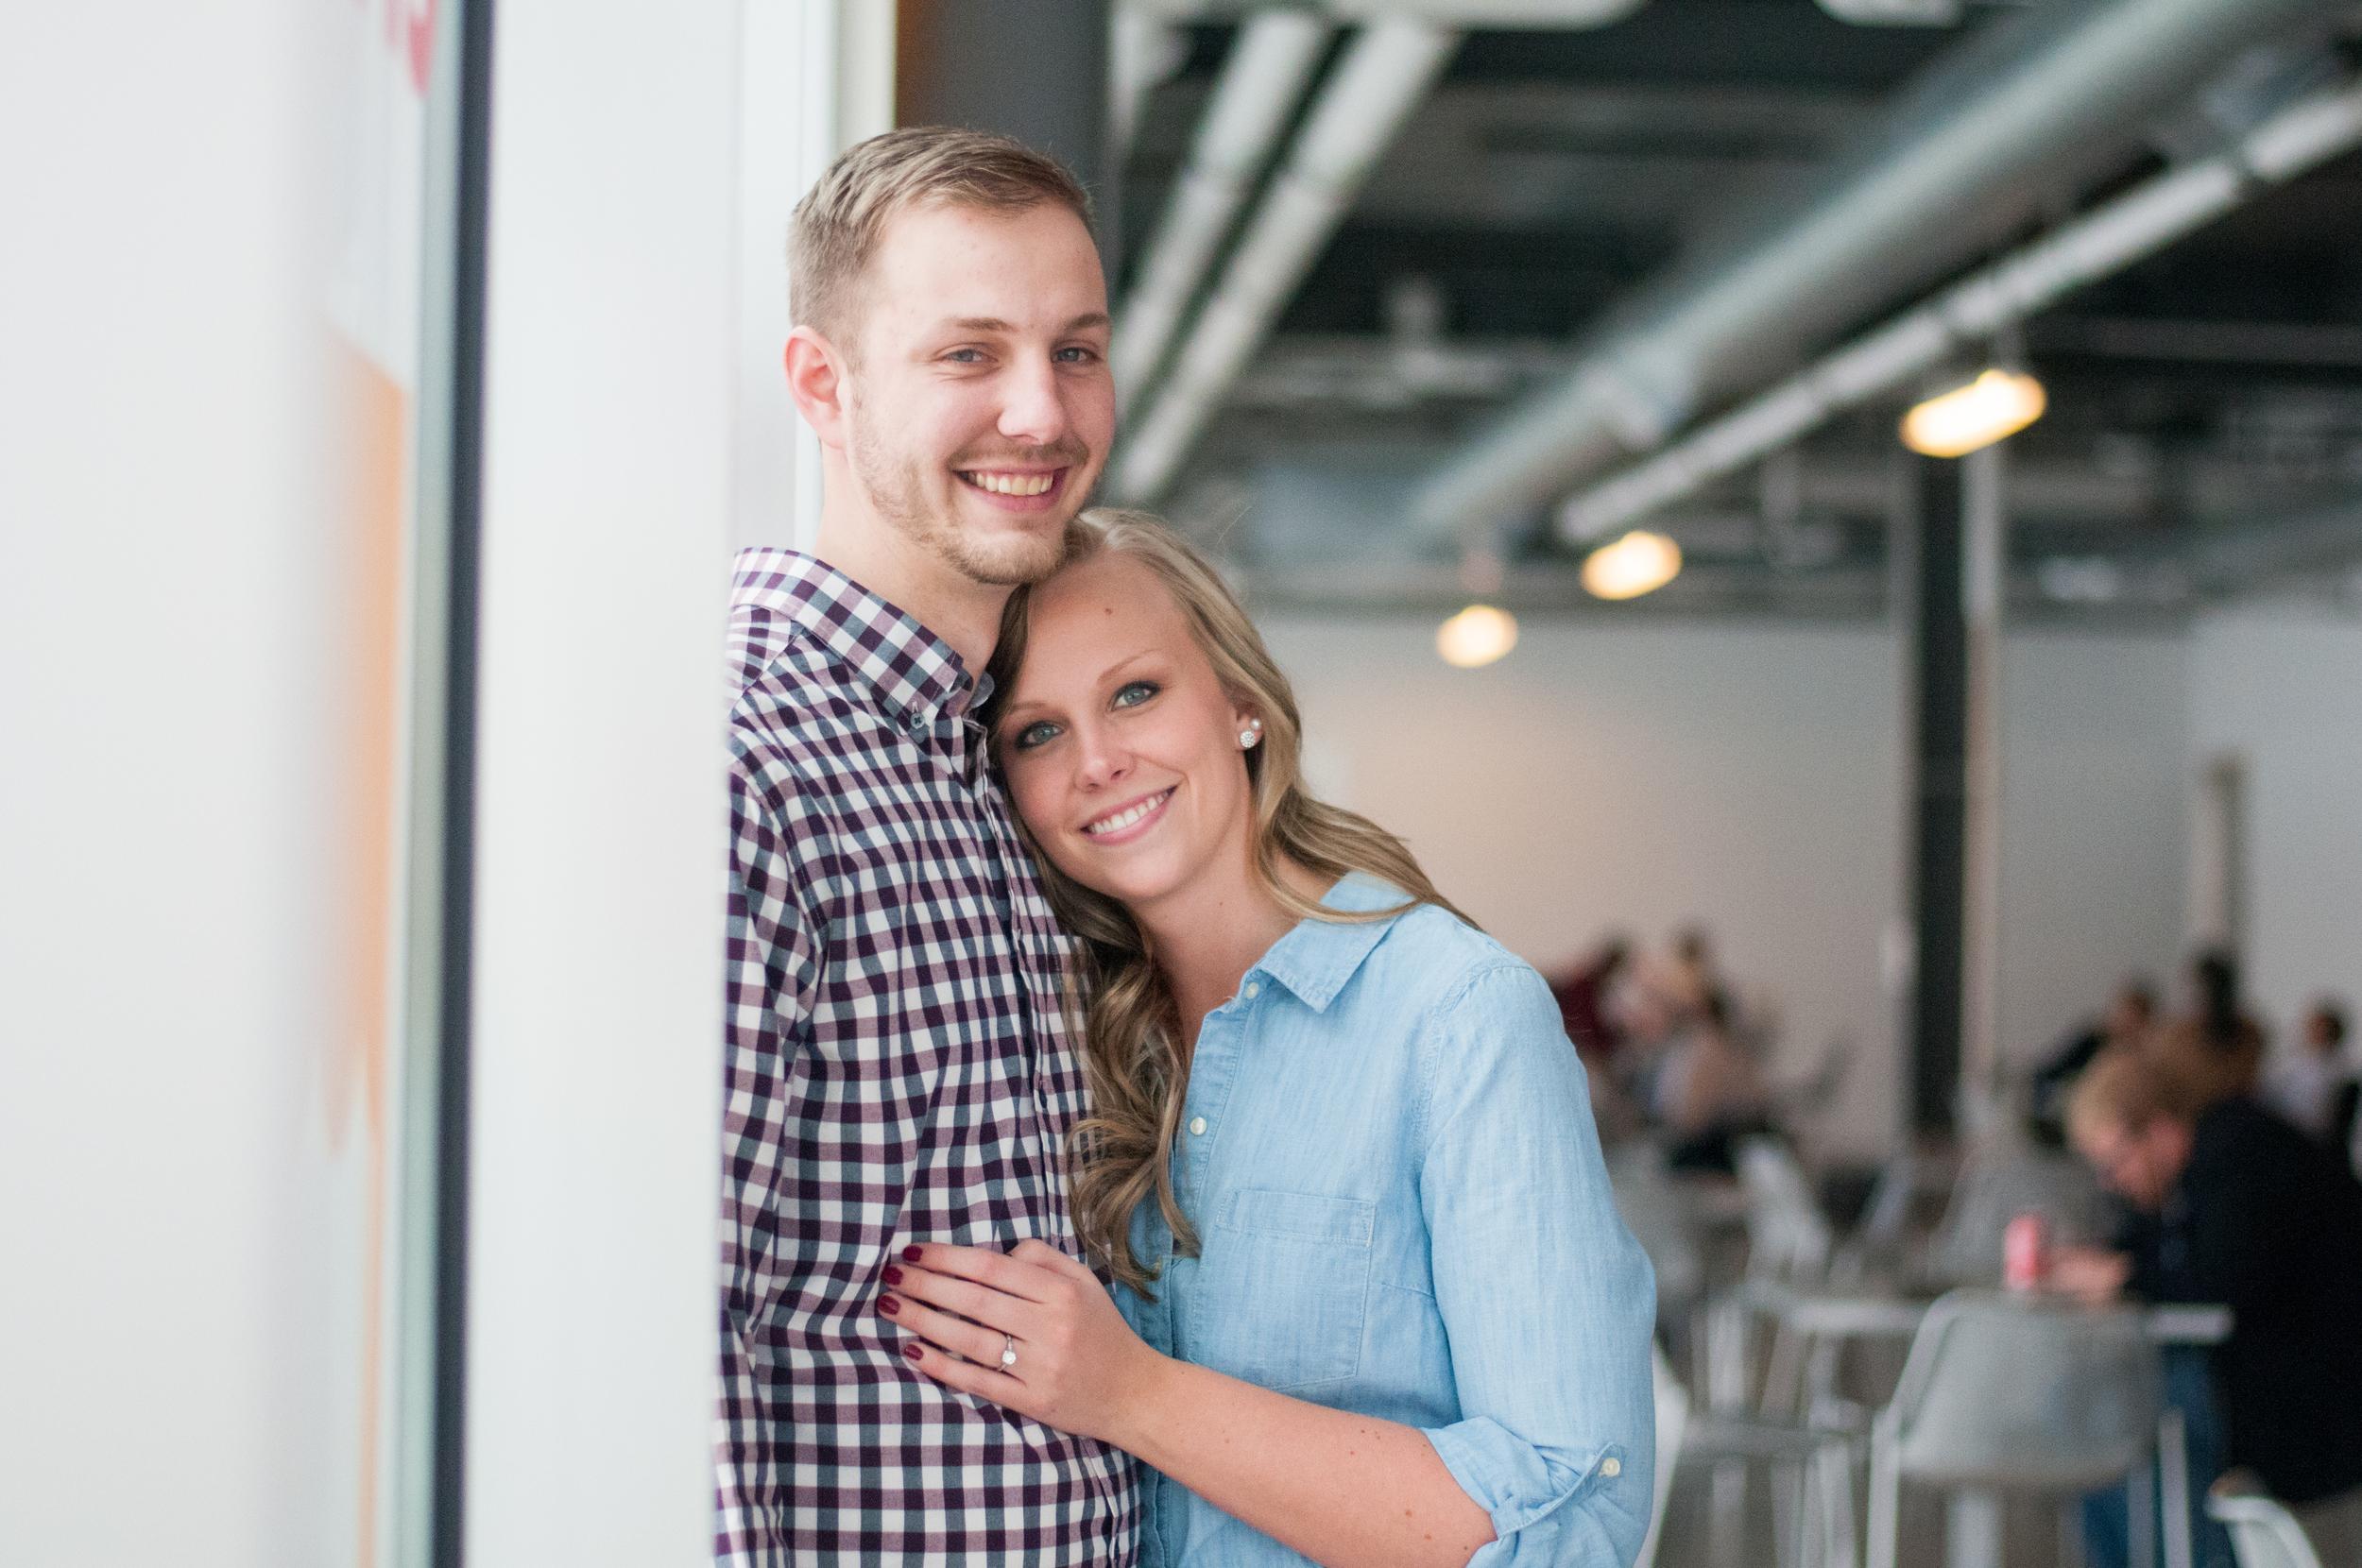 meredithdonnellyphotography-Engagement Kyleigh & Josh-23.jpg